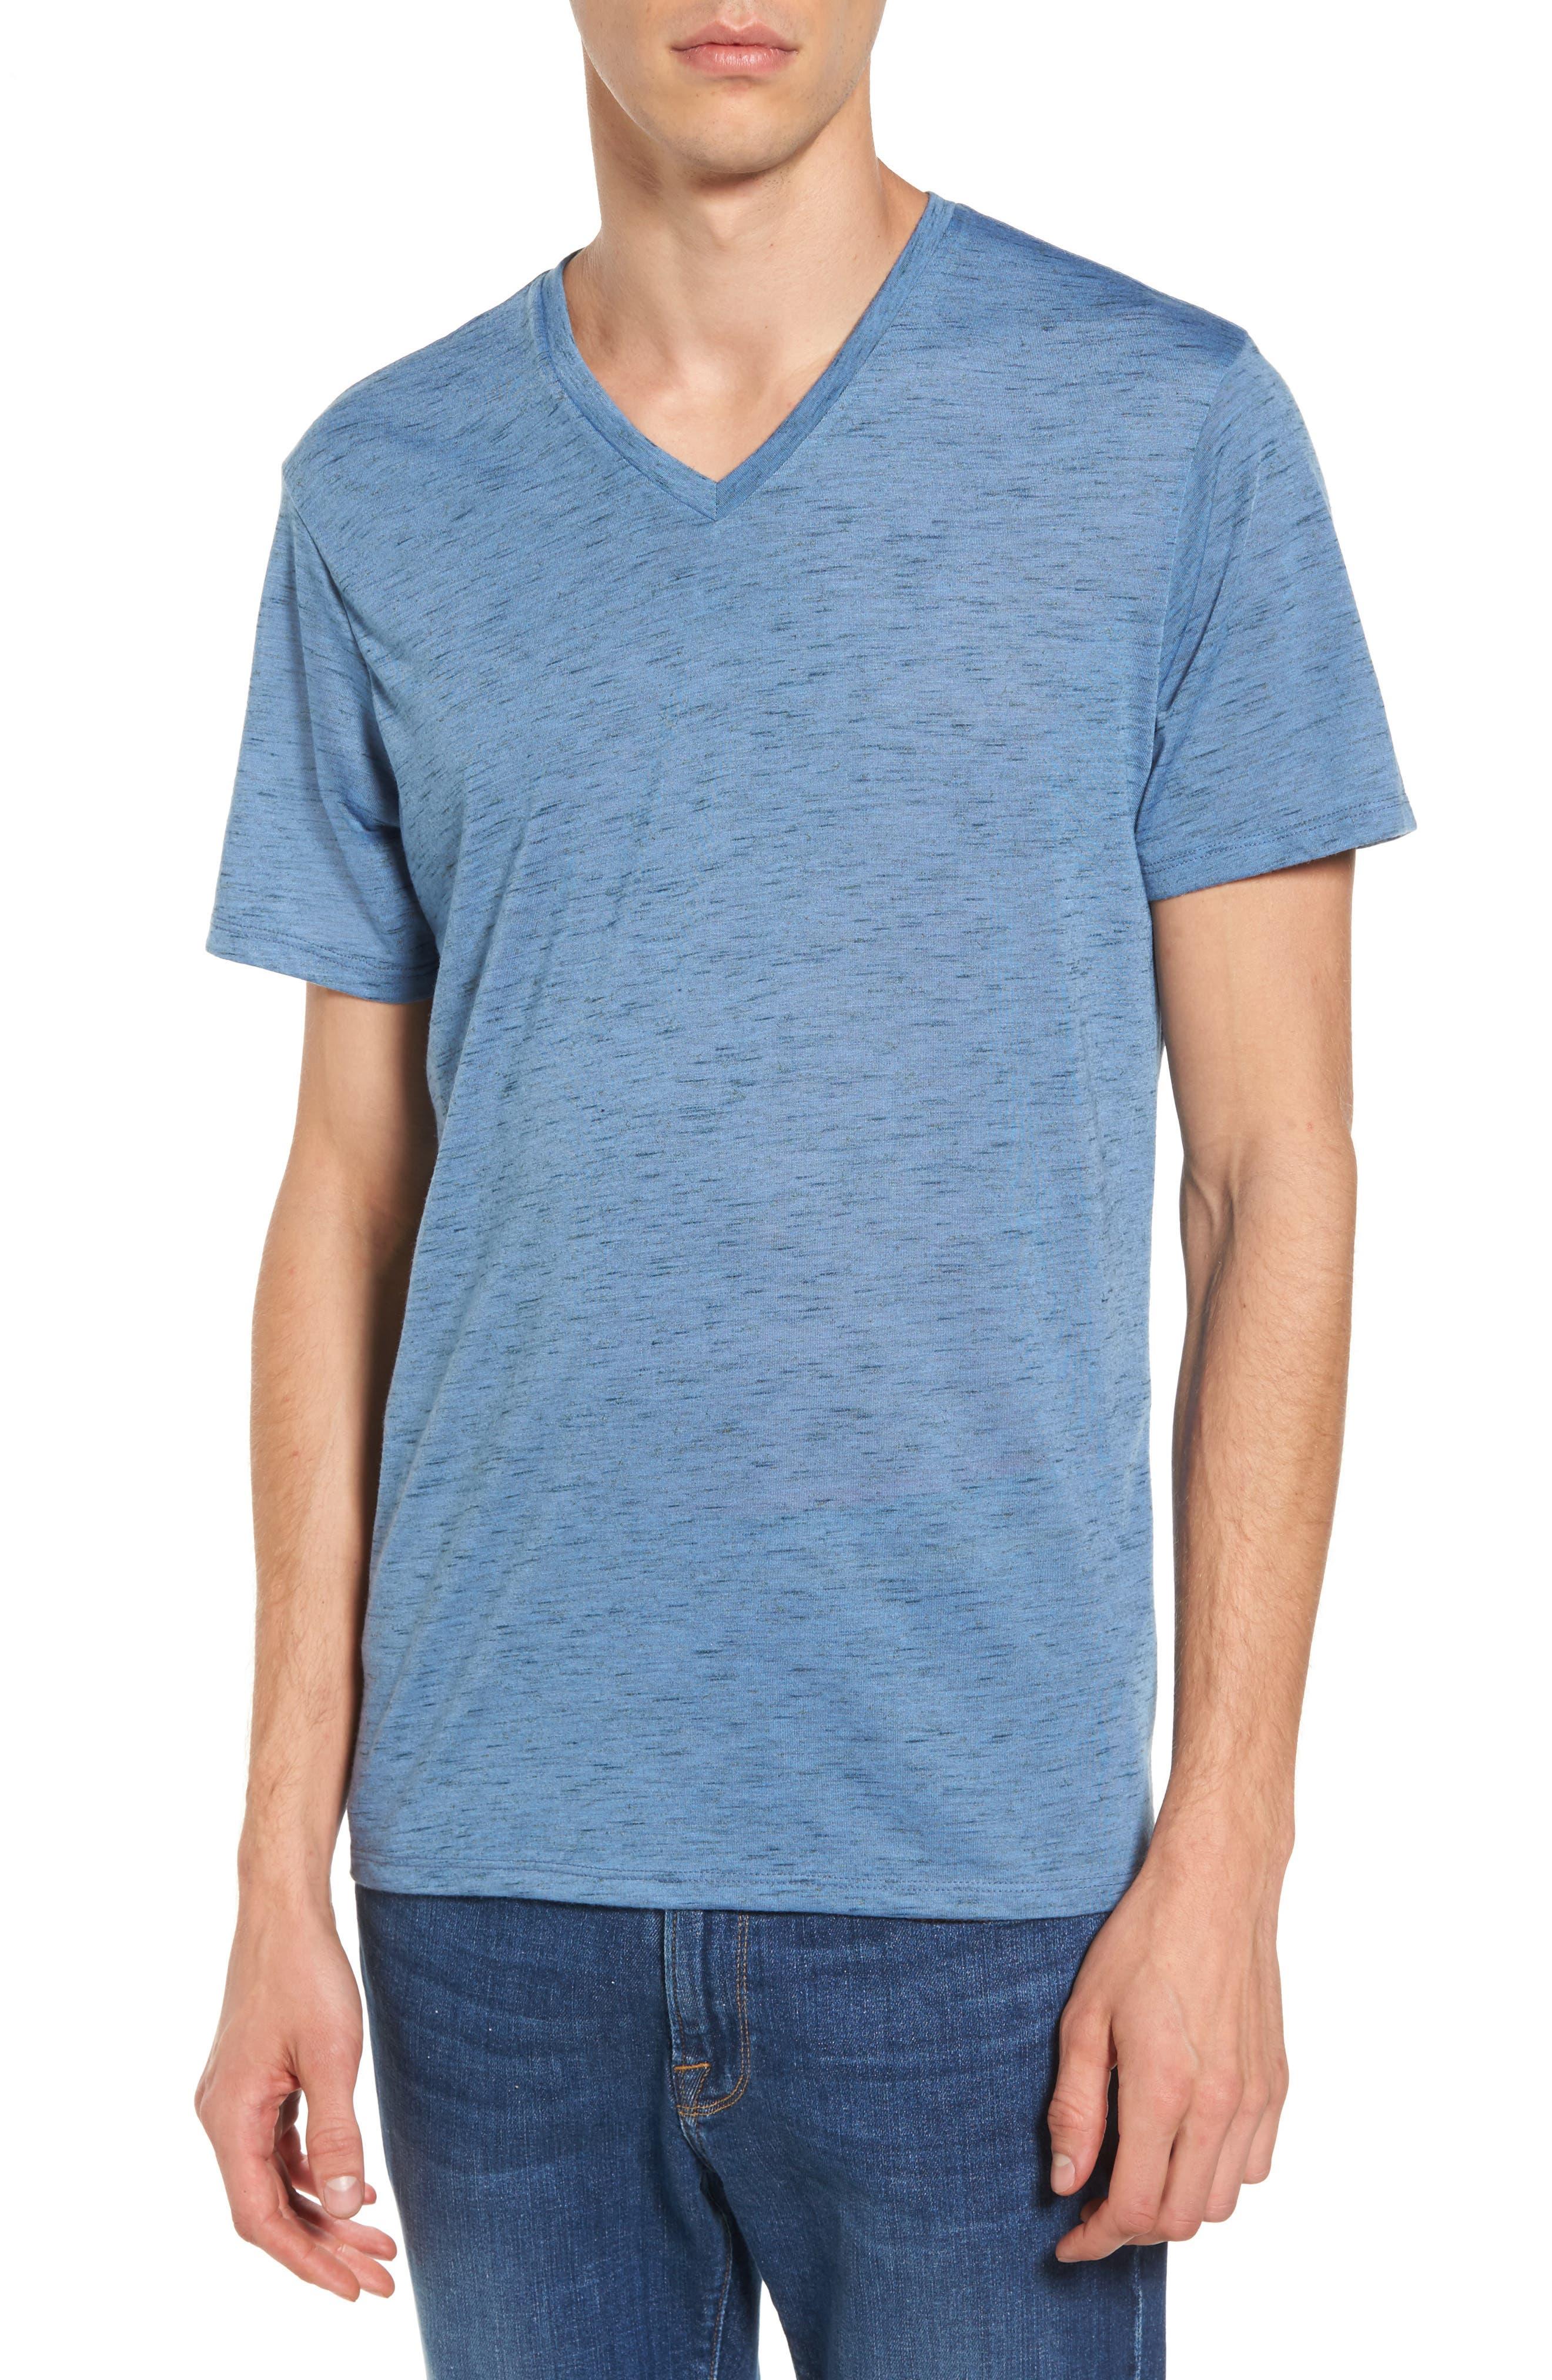 The Rail Streaky V-Neck T-Shirt